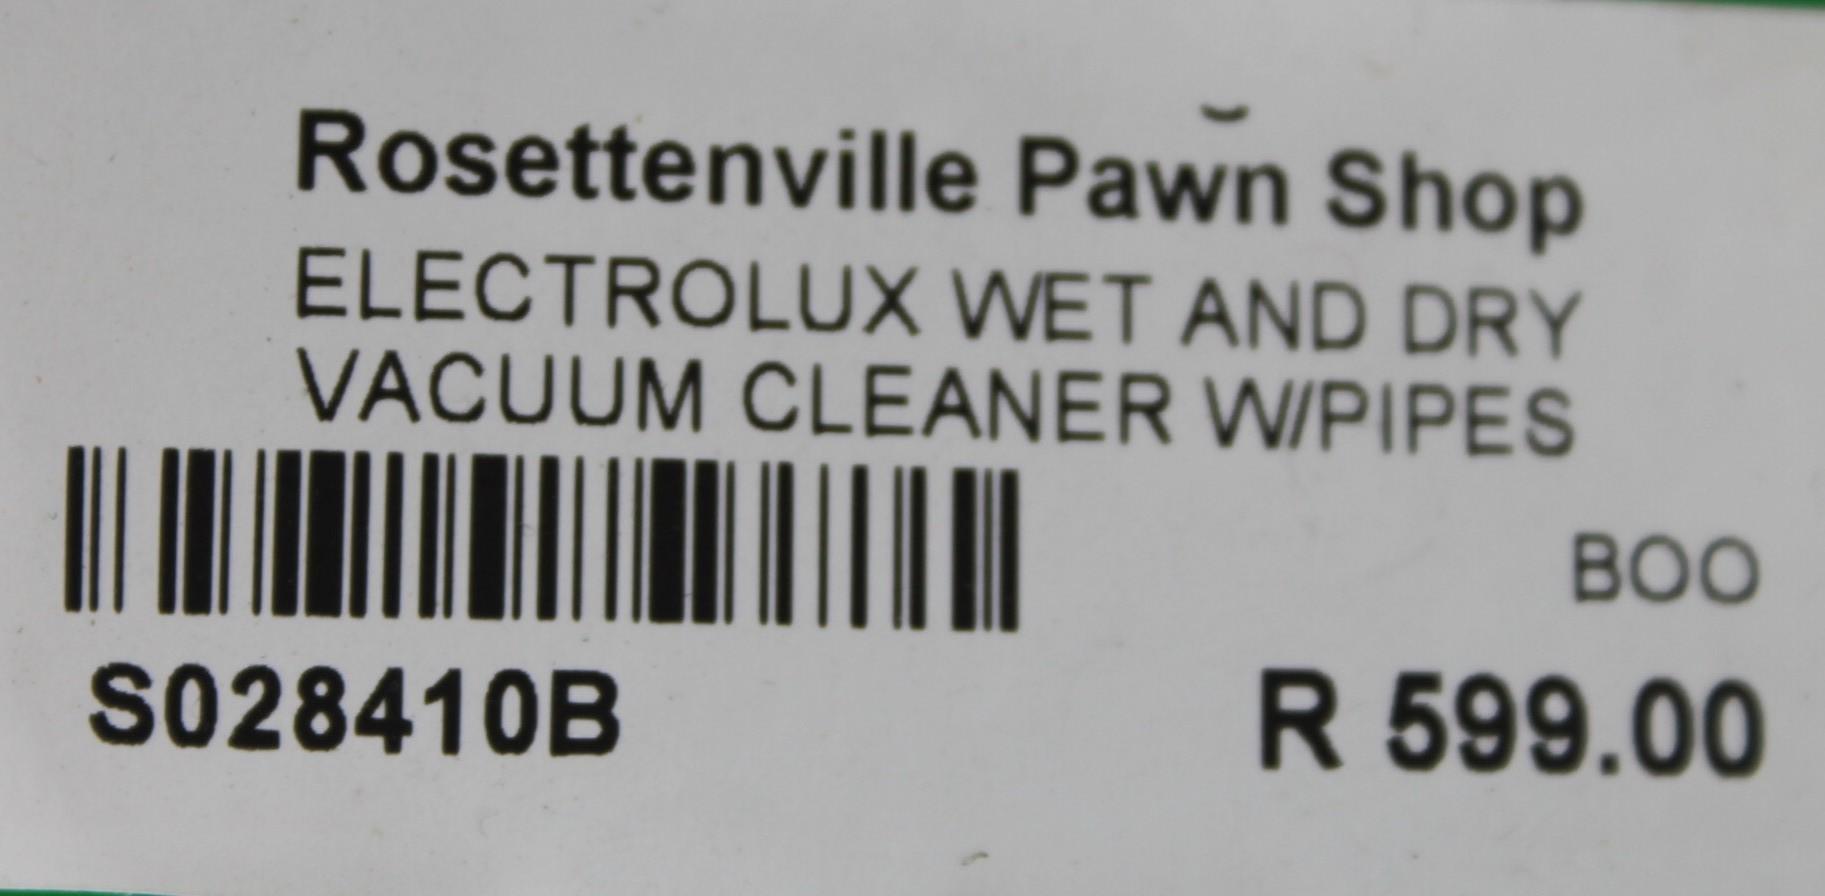 Electrolux vacuum cleaner S028410b #Rosettenvillepawnshop